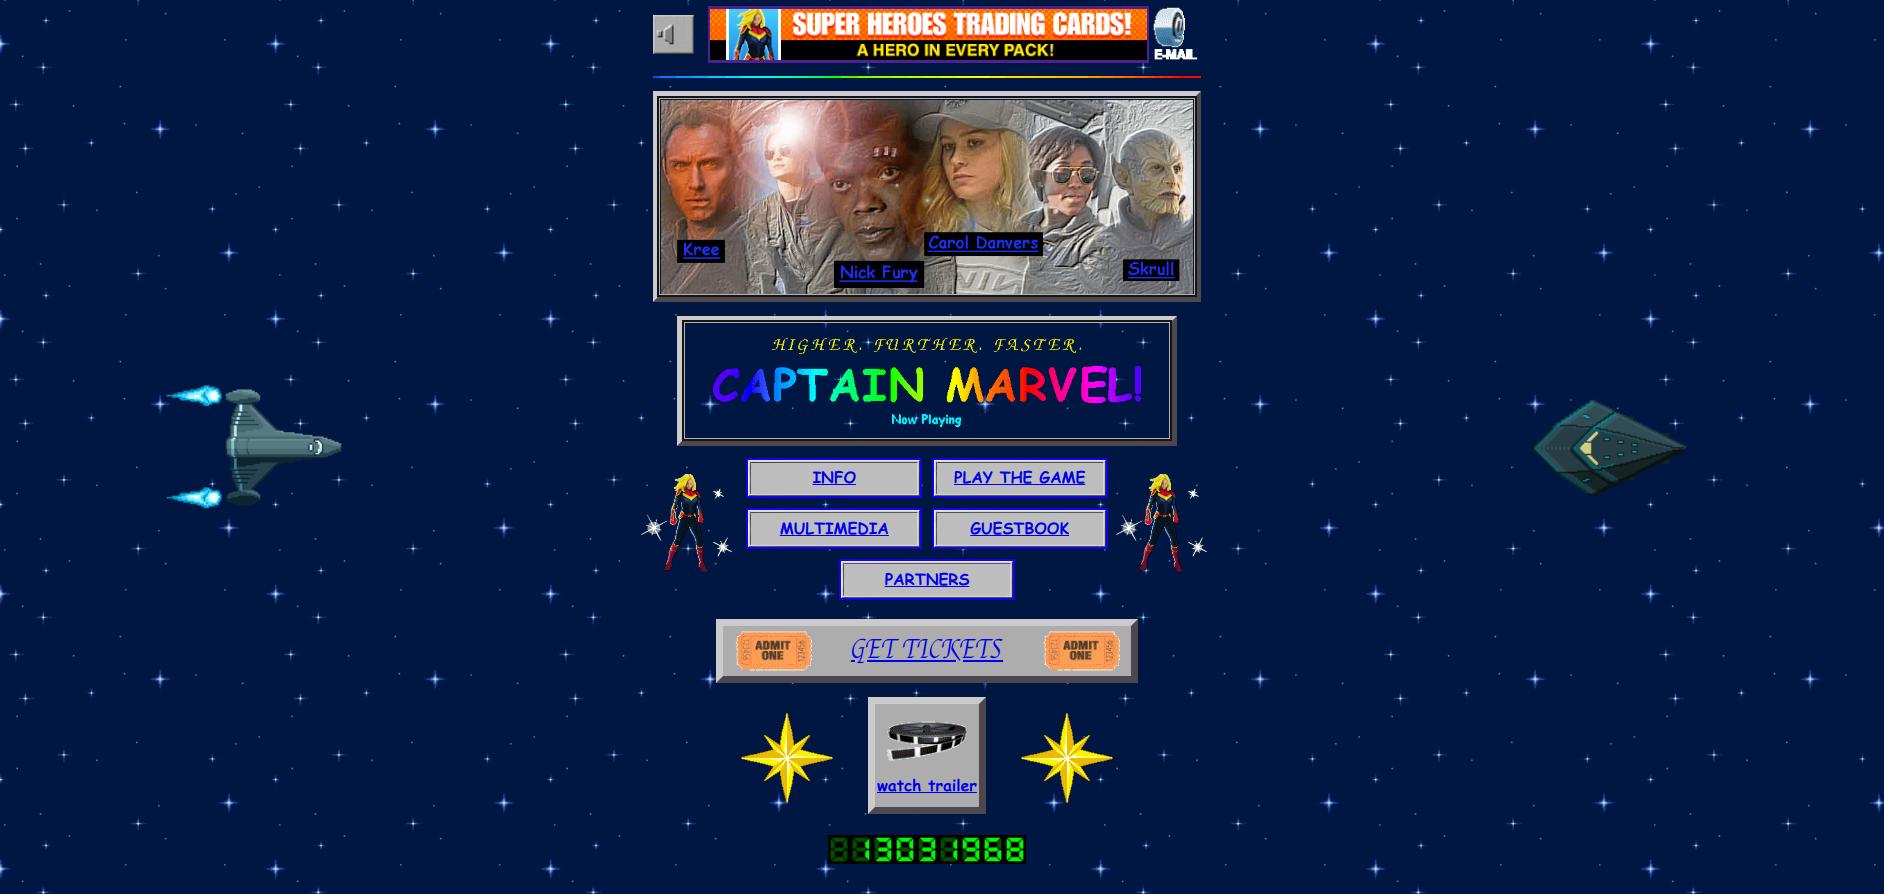 Captain Marvel's 90s landing page